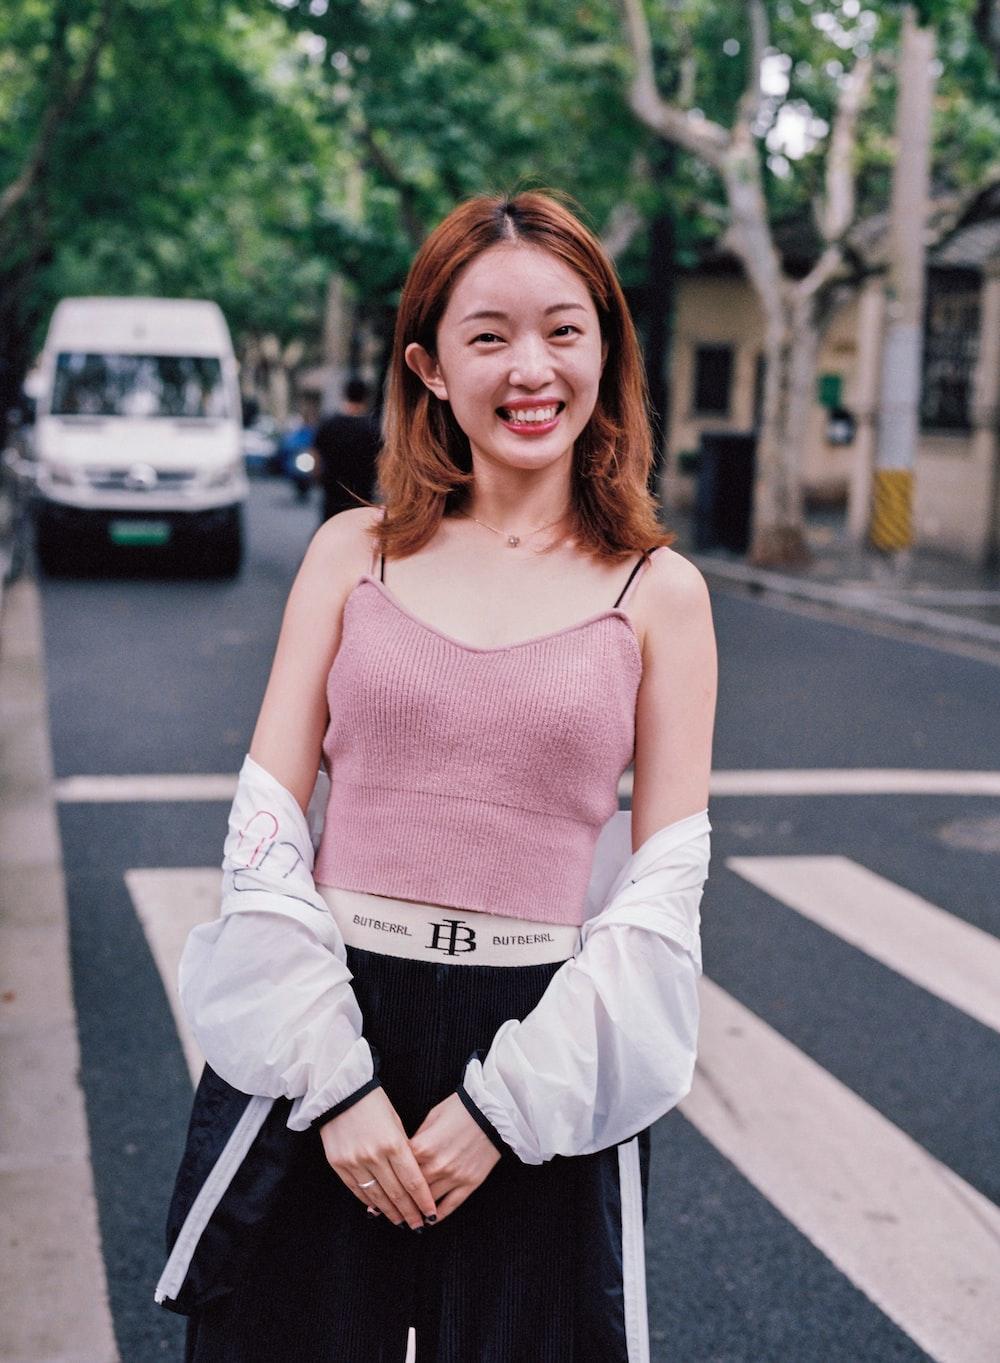 woman in pink top beside pedestrian lane